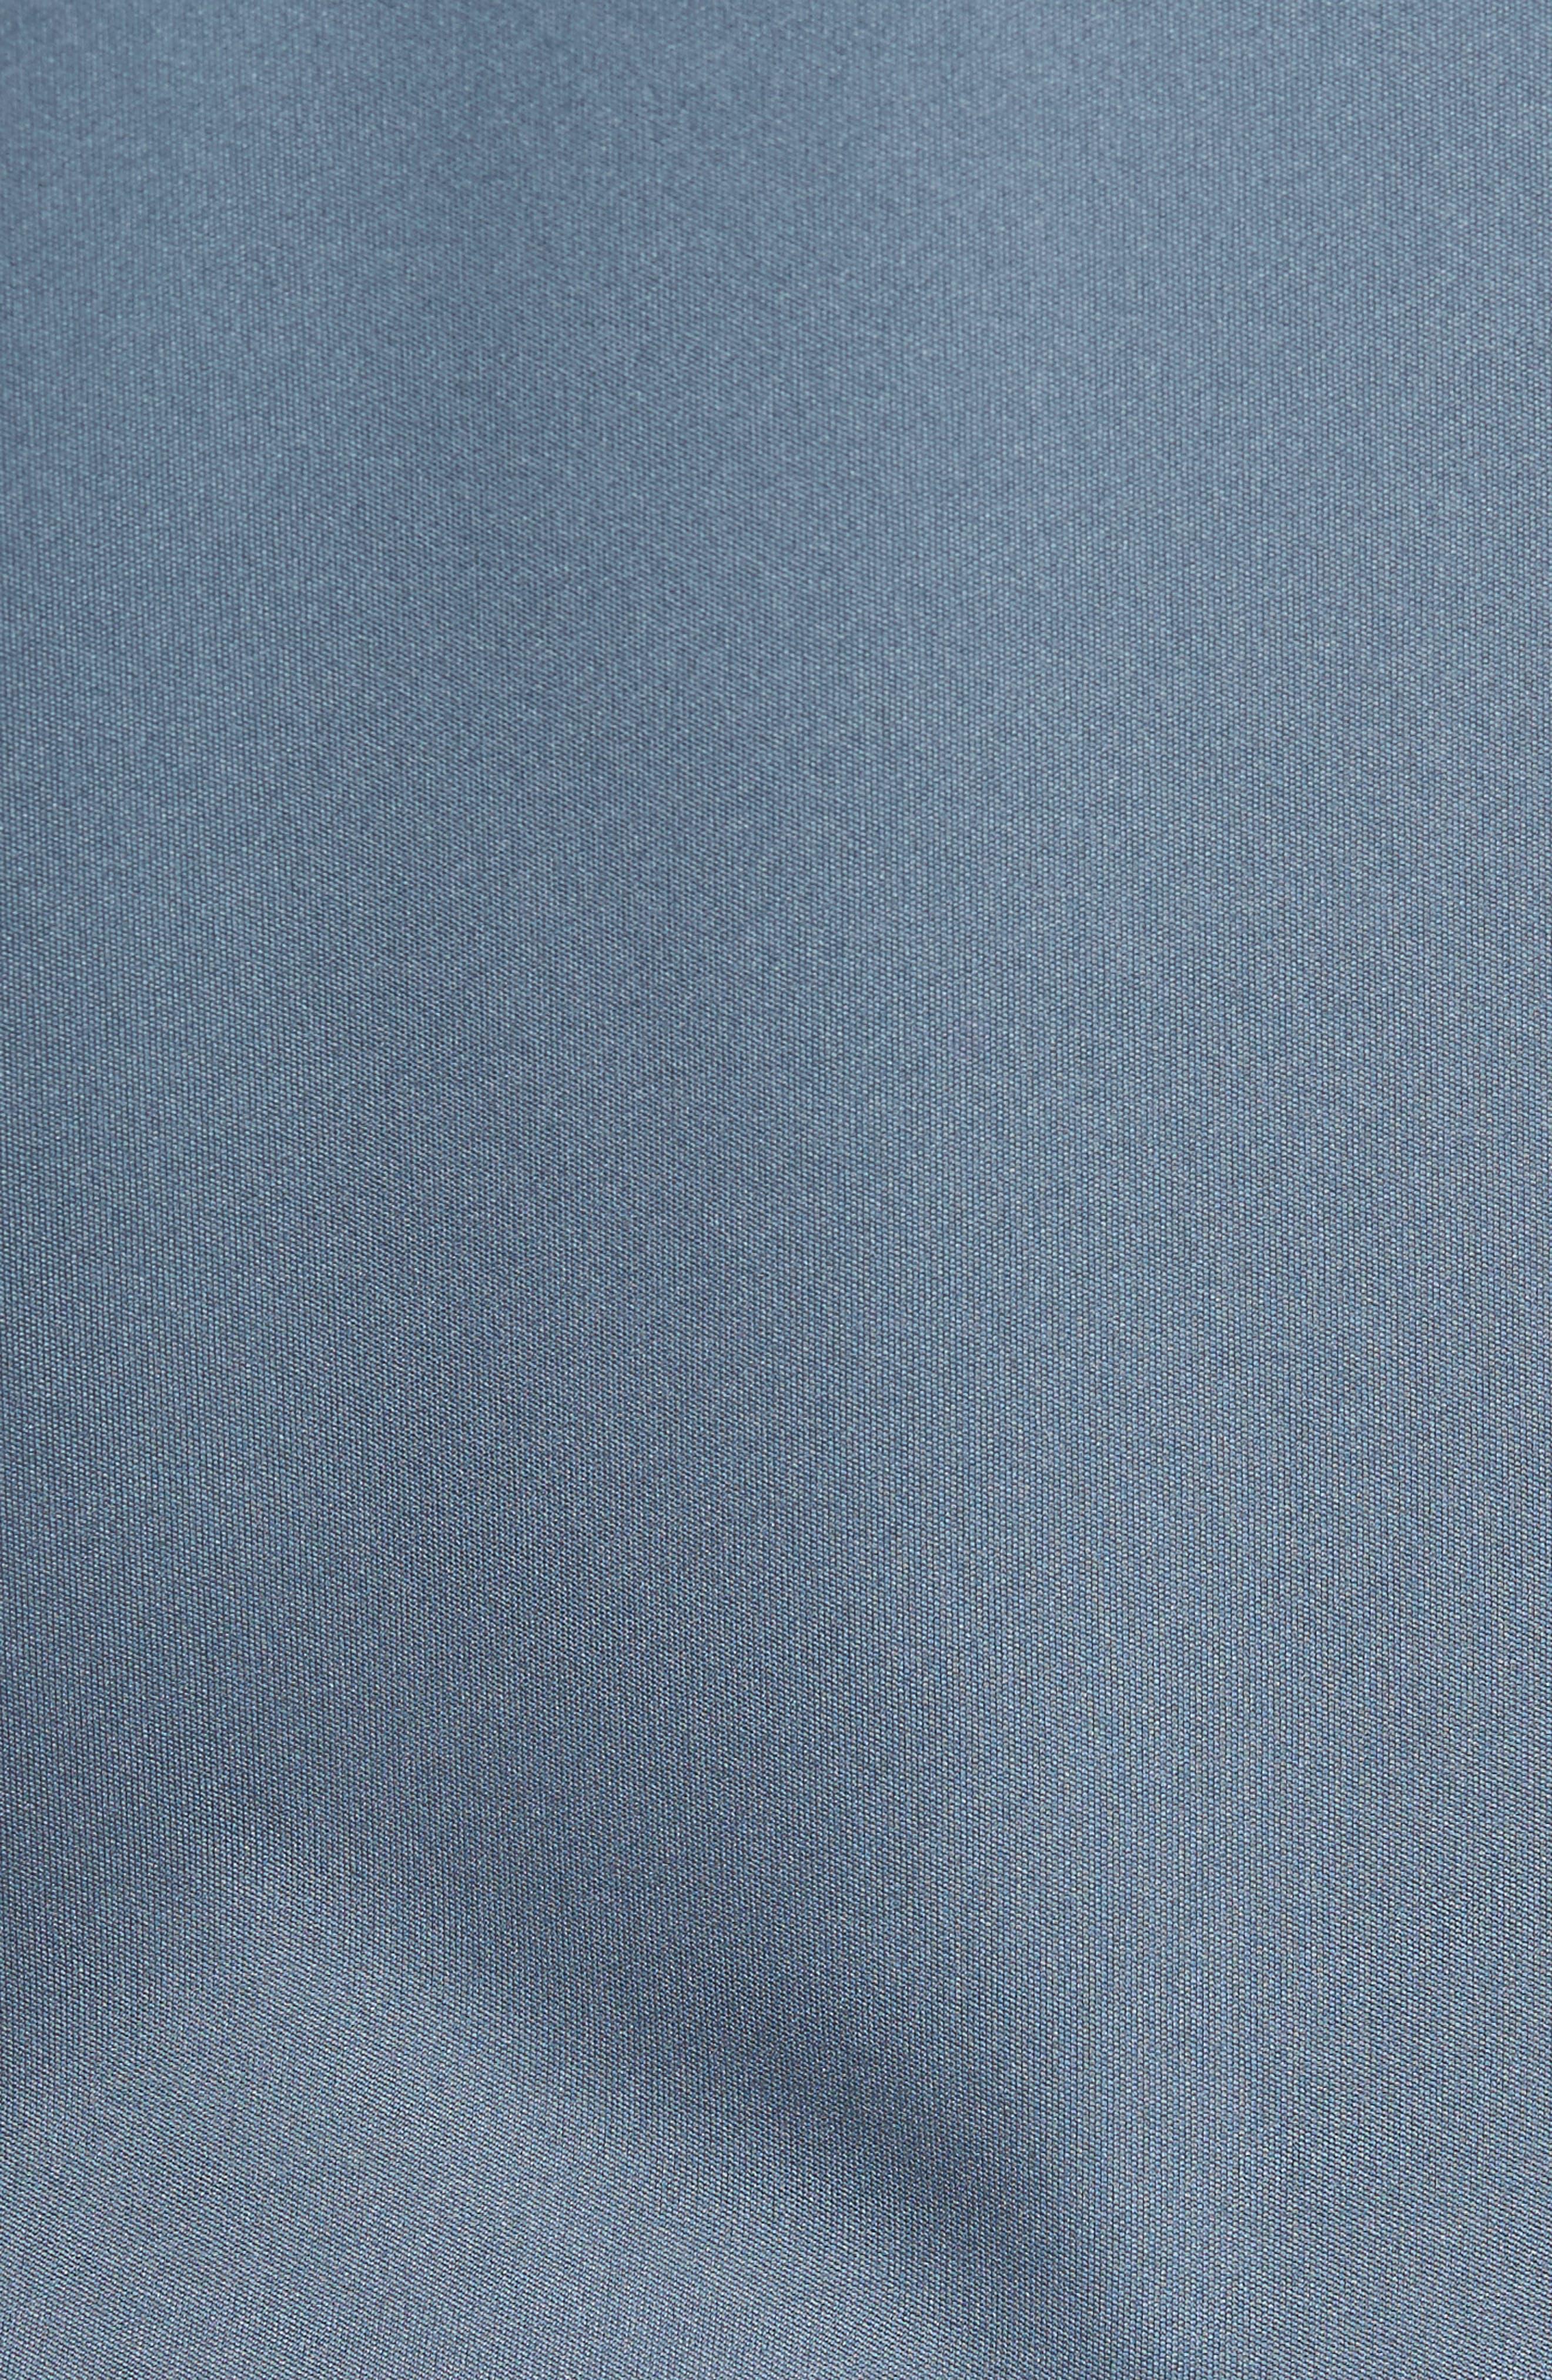 Divisional Polo Shirt,                             Alternate thumbnail 5, color,                             DARK SLATE